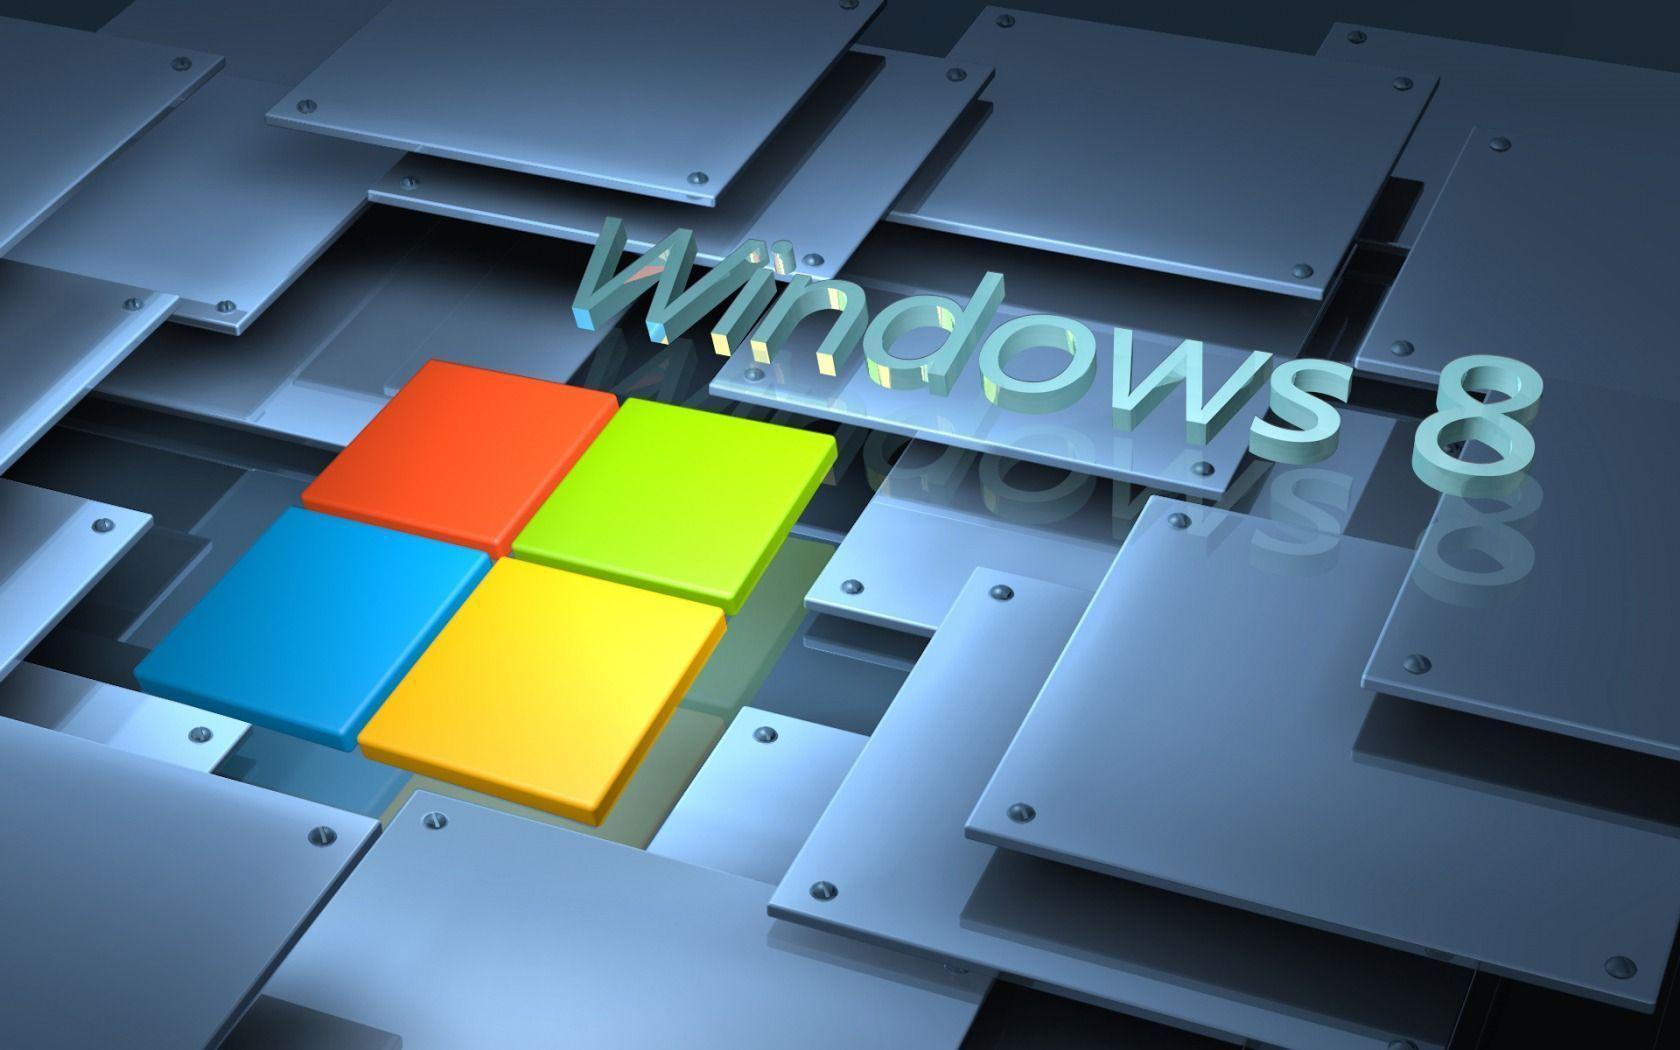 Windows 8 3d Wallpapers Wallpaper Cave